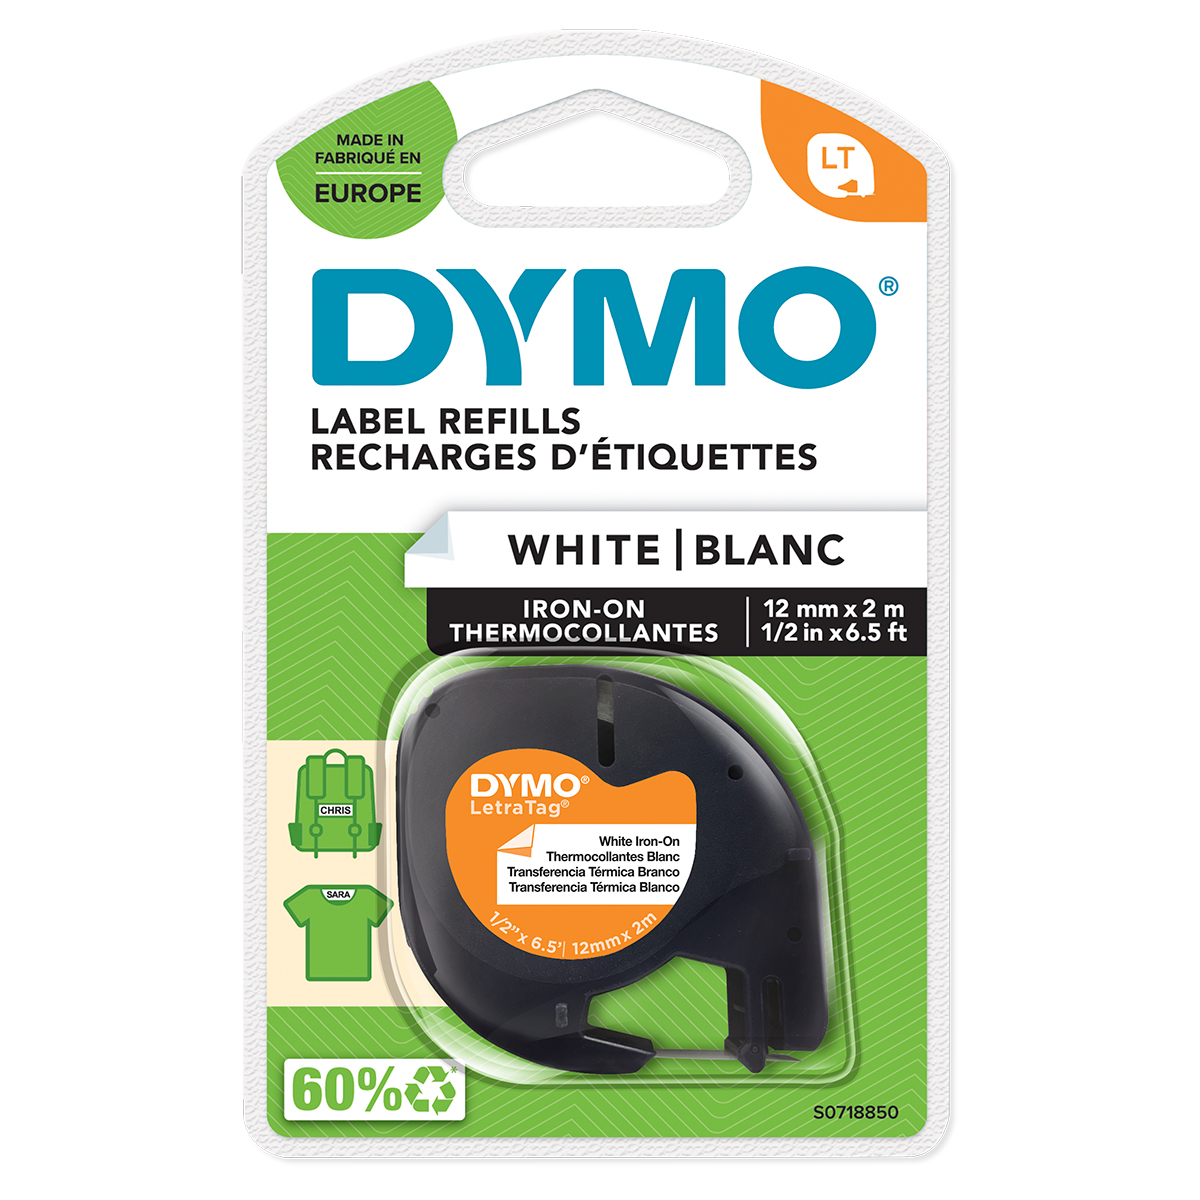 Dymo 18769 12mm x 2m Black on White Iron on Tape